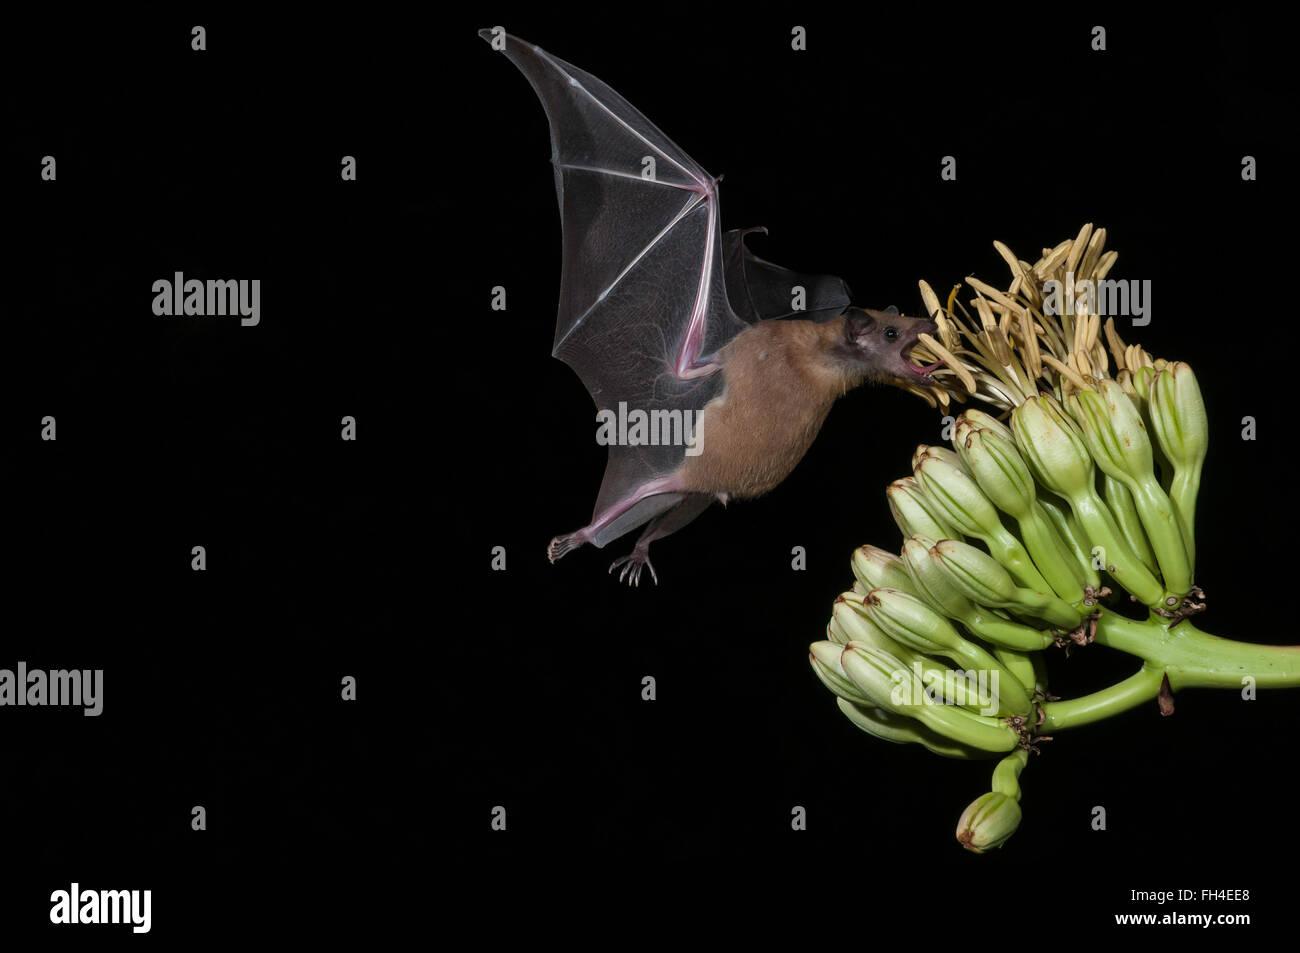 Geringerem Langnasen-Fledermaus, Leptonycteris Yerbabuenae (Curasoae), ernähren sich von Agave blüht, Green Valley, Arizona, USA Stockfoto